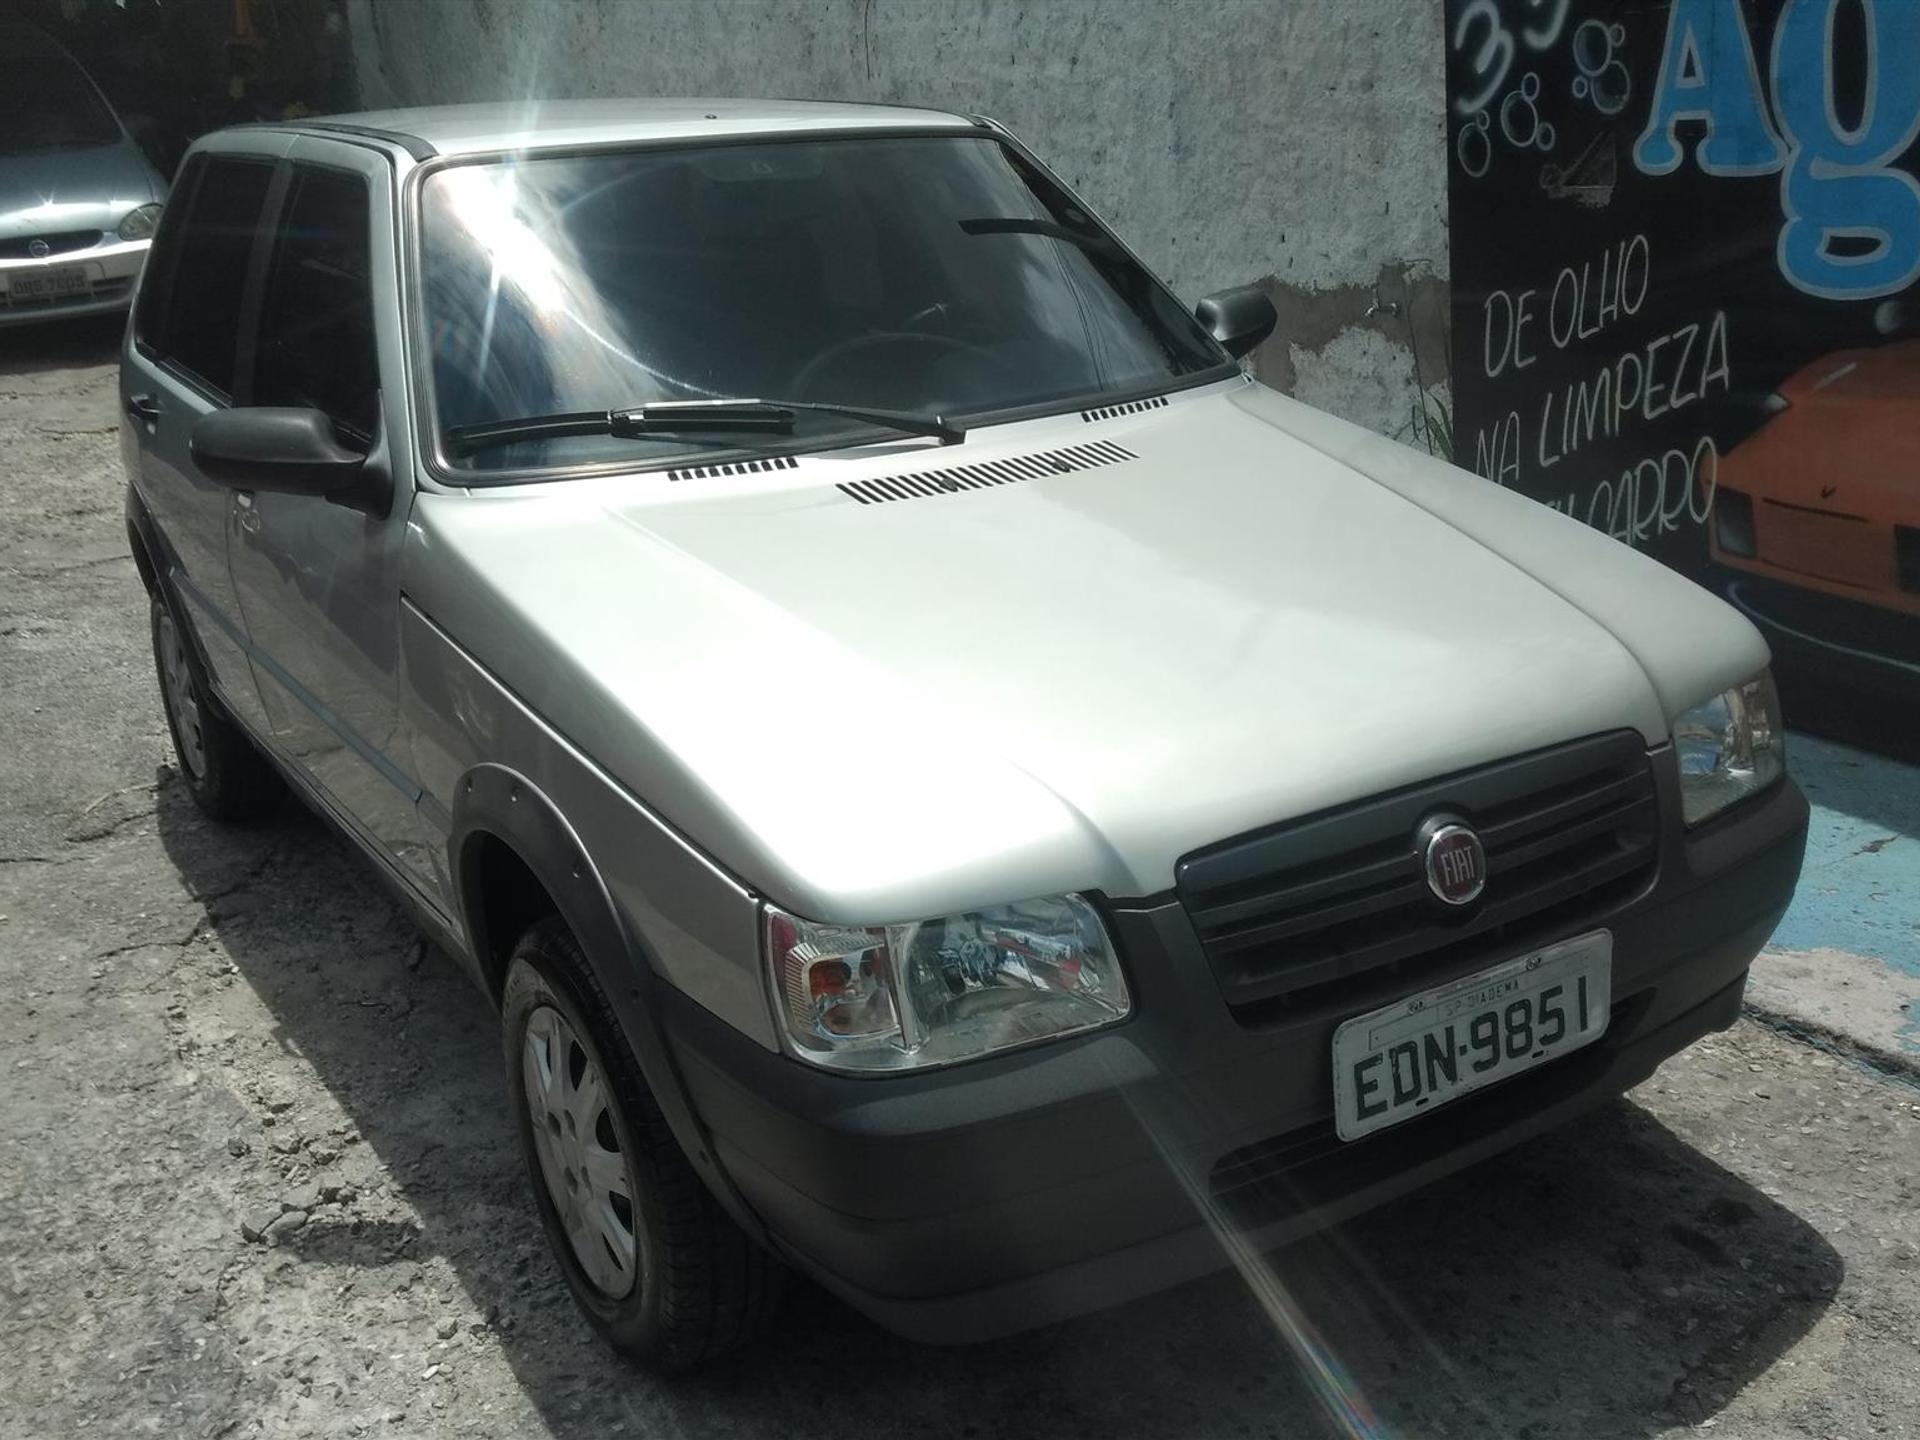 Fiat Uno 1.0 Mpi Mille Way Economy 8v Flex 4p Manual Wmimagem15310598966